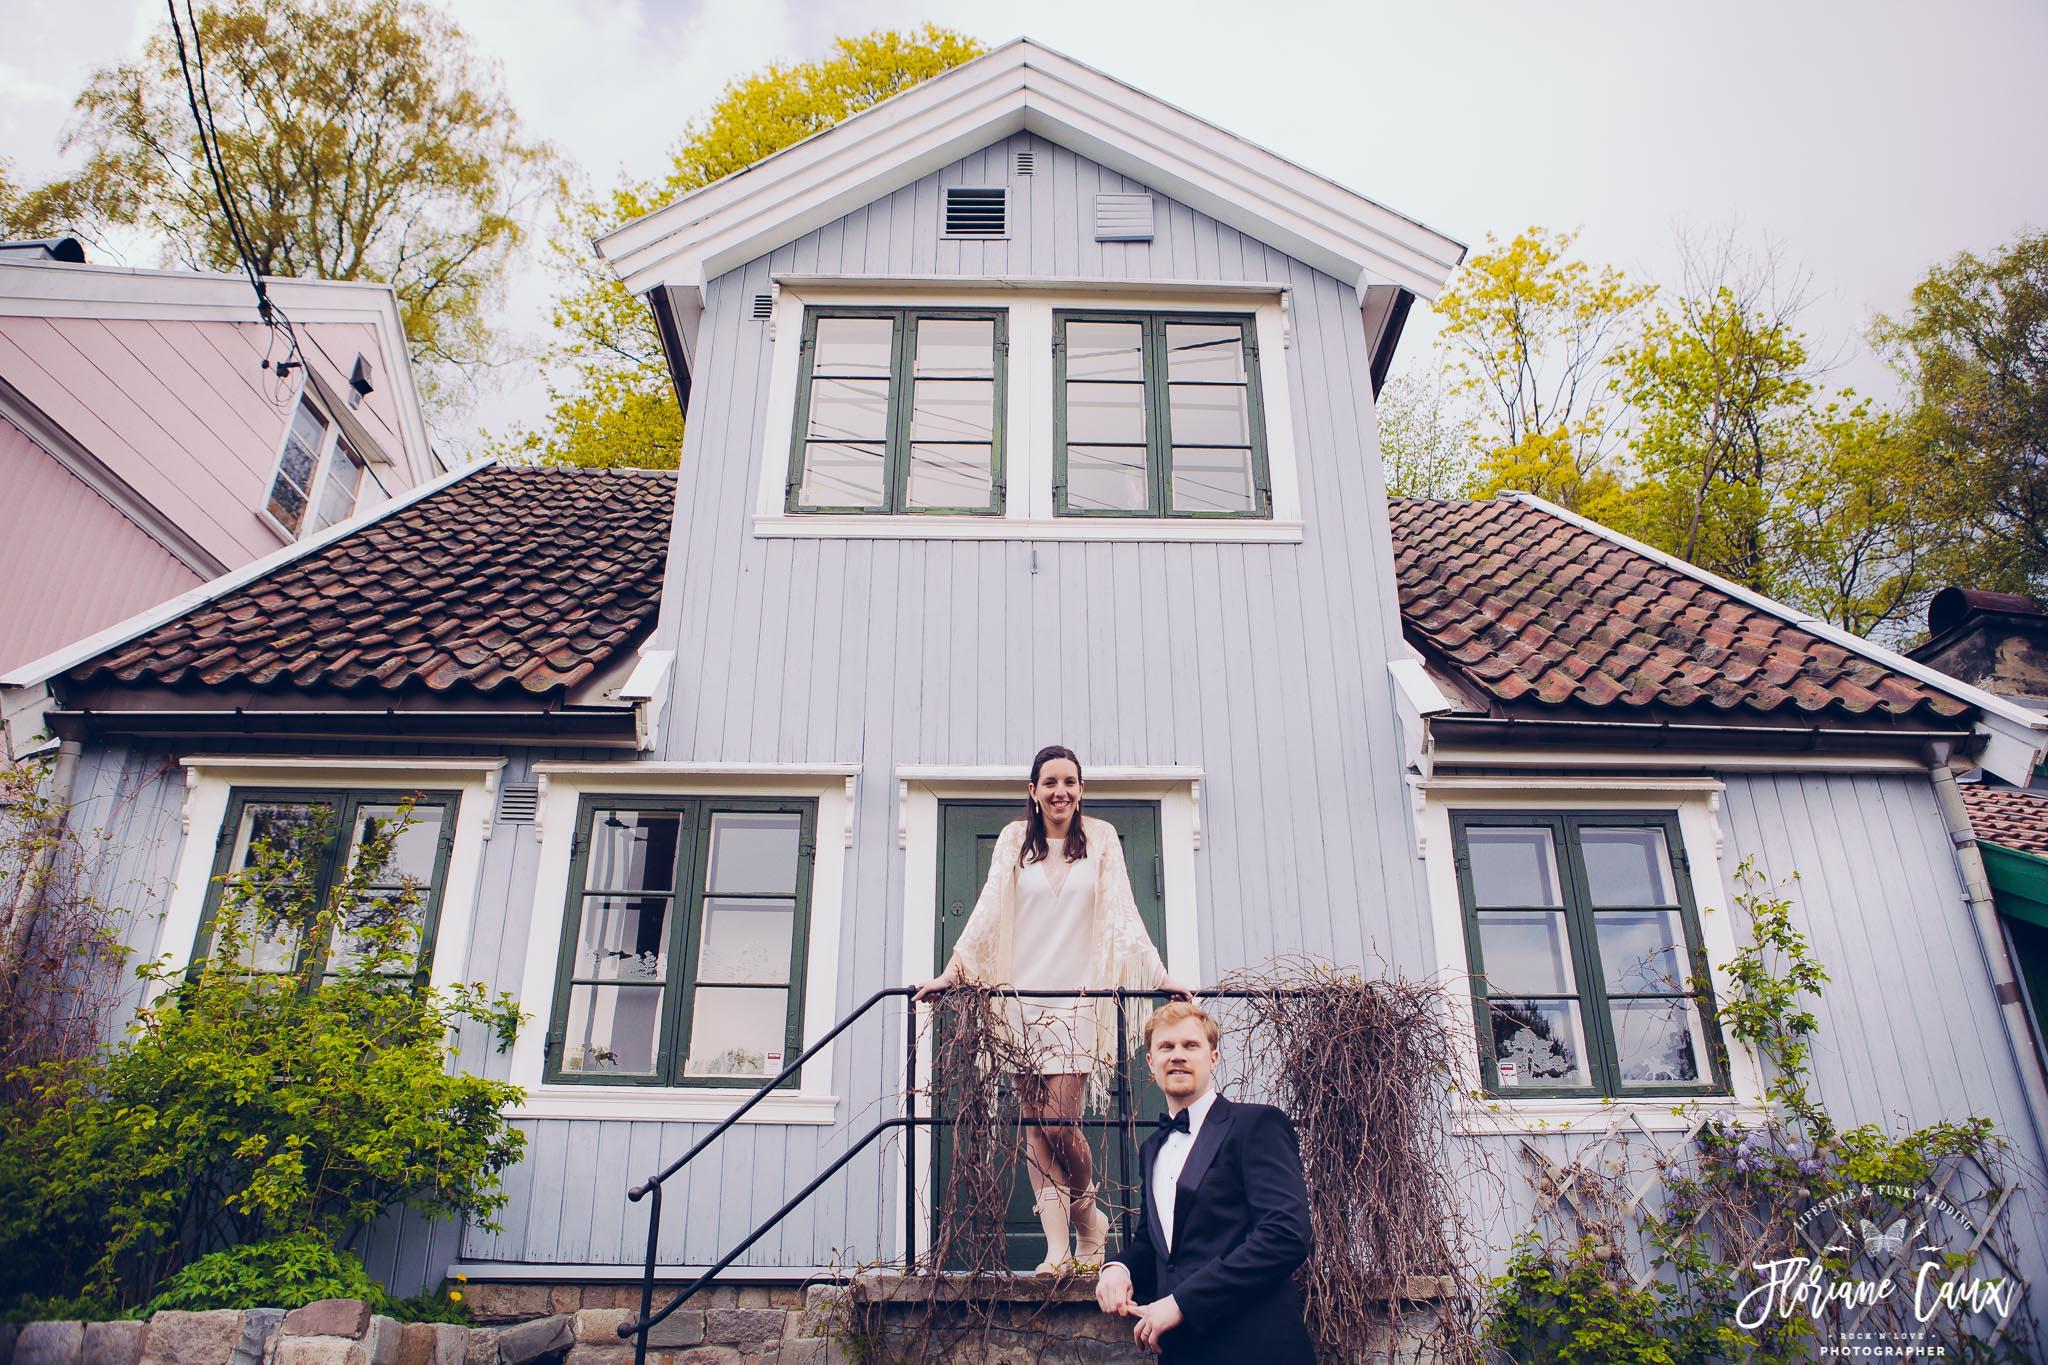 destination-wedding-photographer-oslo-norway-floriane-caux-10